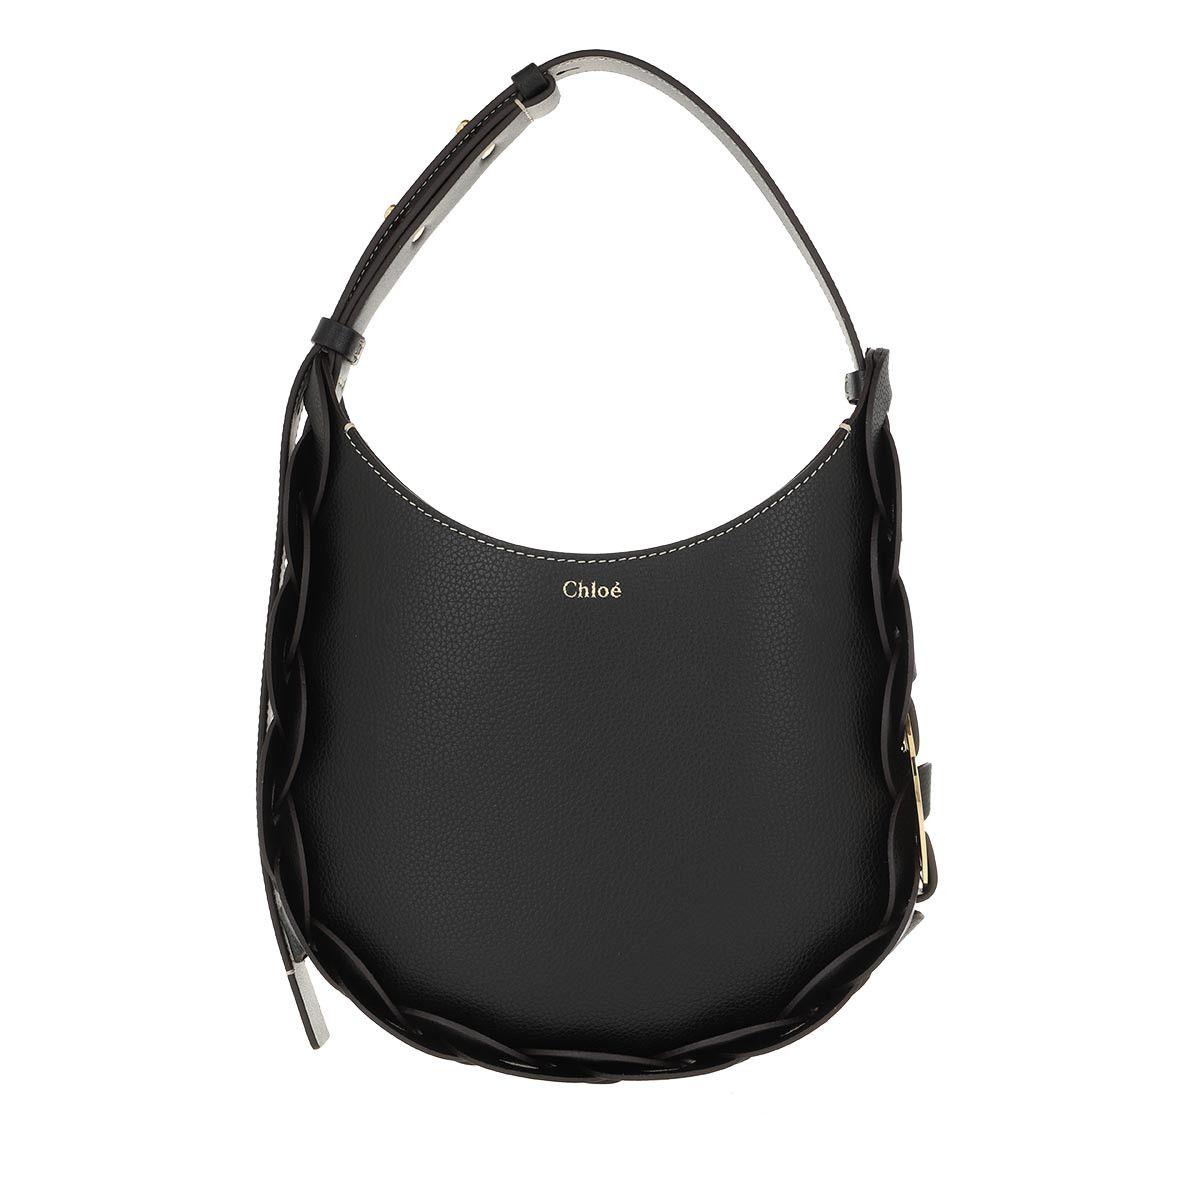 Chloé Hobo Bag - Darryl Small Hobo Bag Leather Black - in schwarz - für Damen